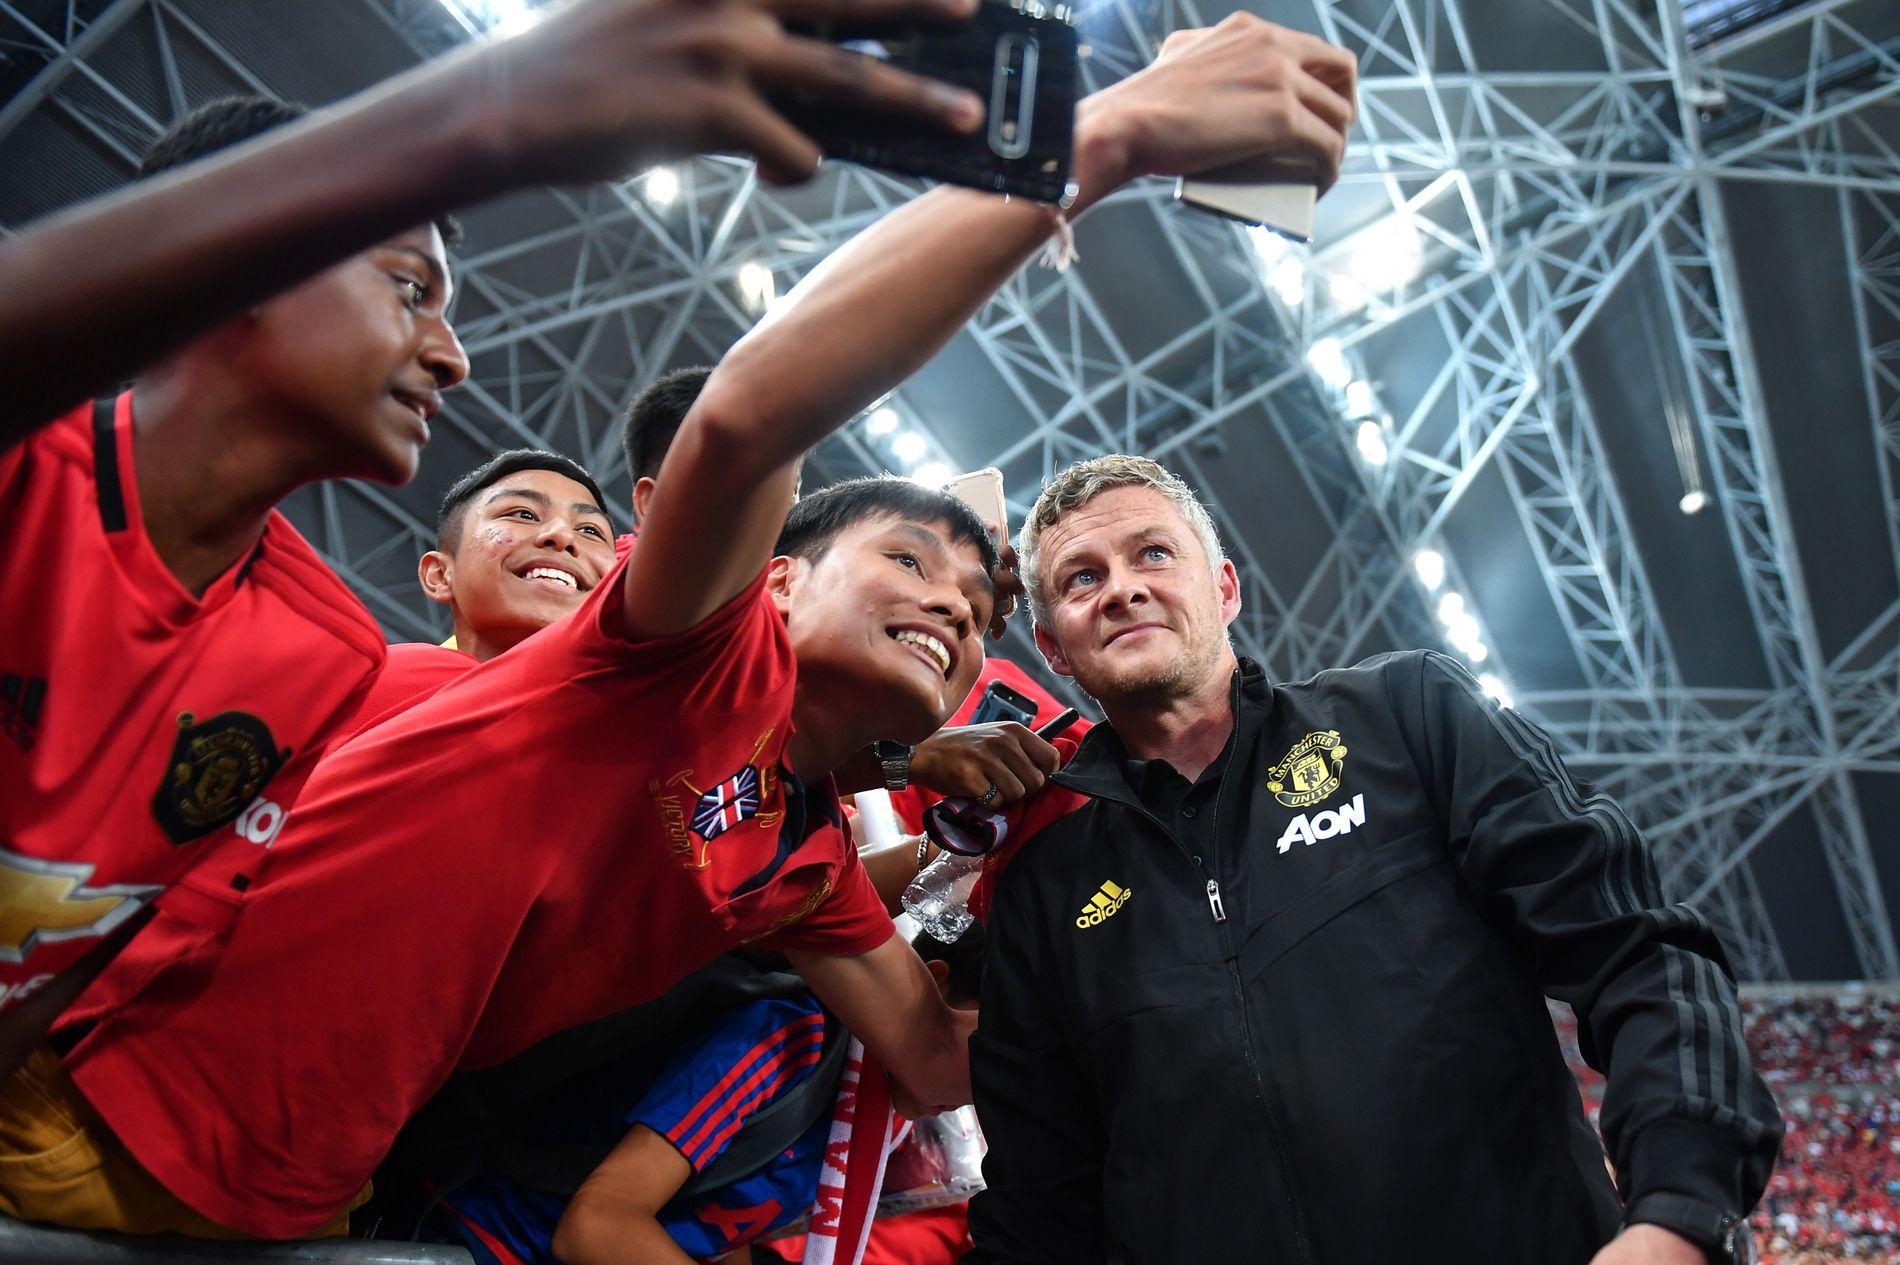 POPULÆR: Ole Gunnar Solskjær stilte til selfies med fansen i Singapore tidligere i sommer.